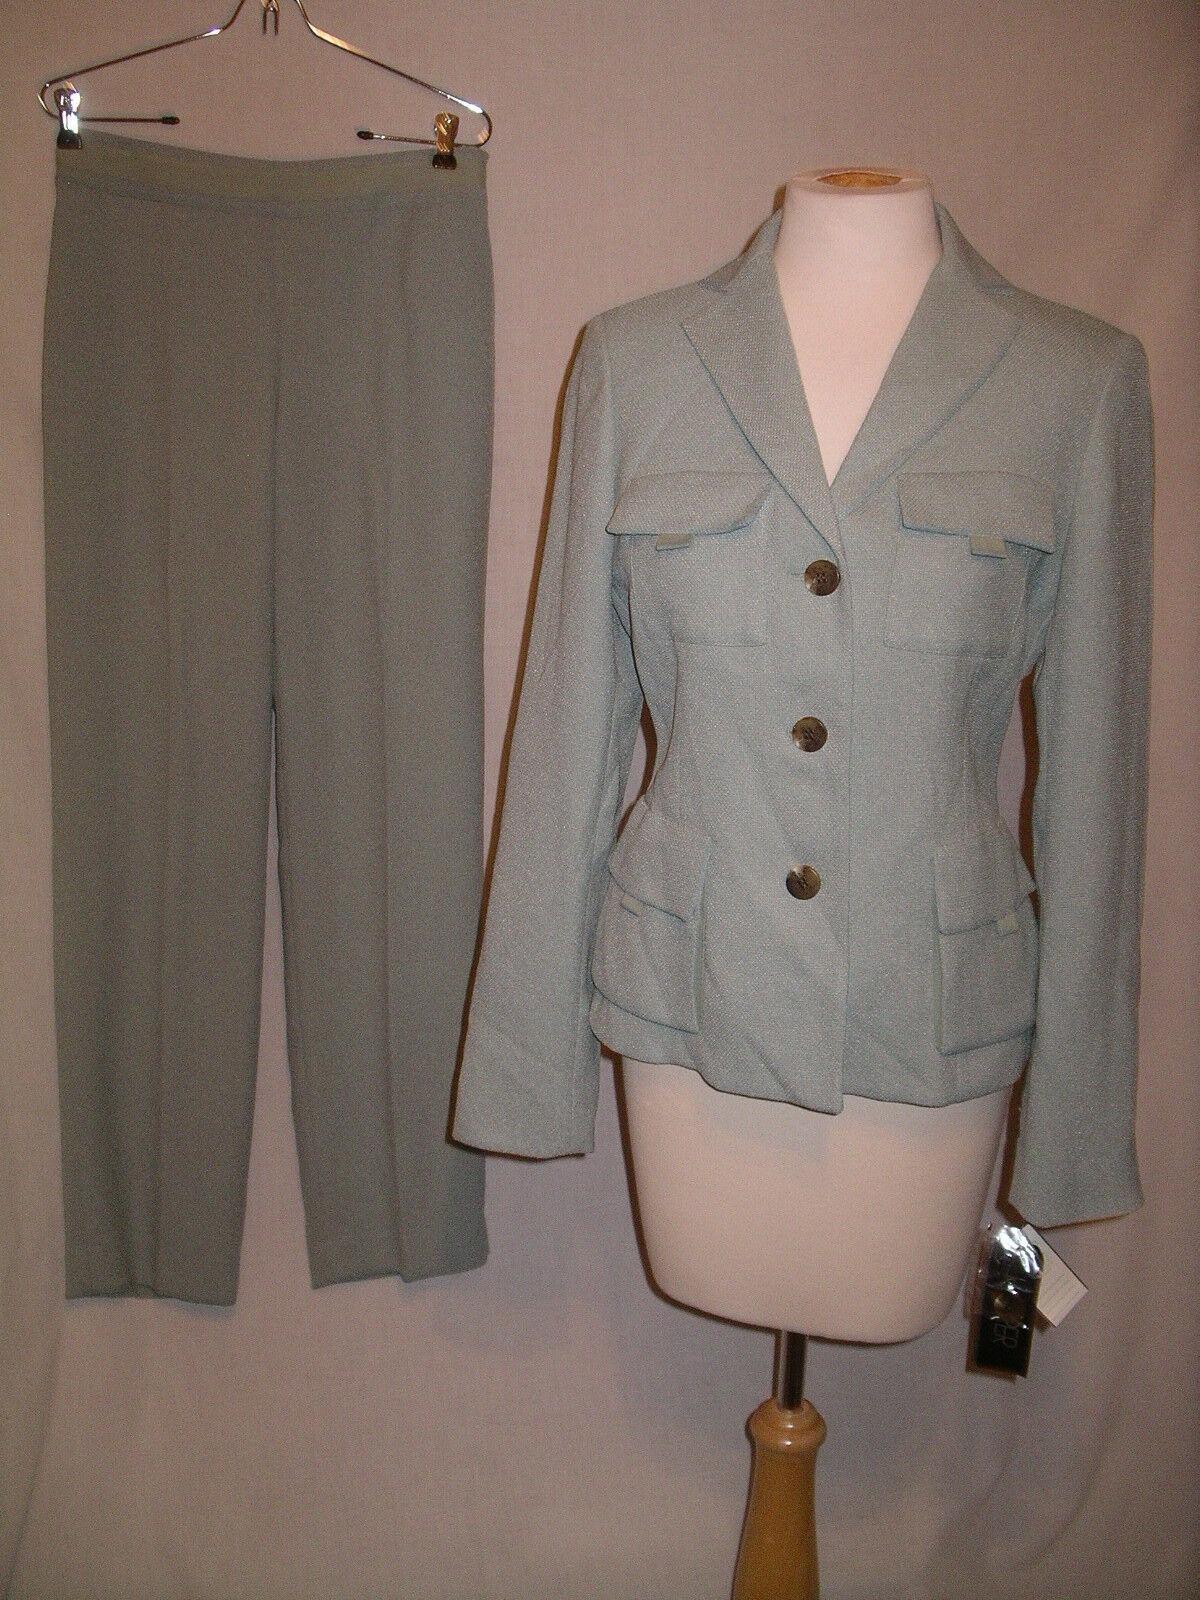 KASPER Lt Seafoam Green Summer Career Pant Suit - 4 - NWT